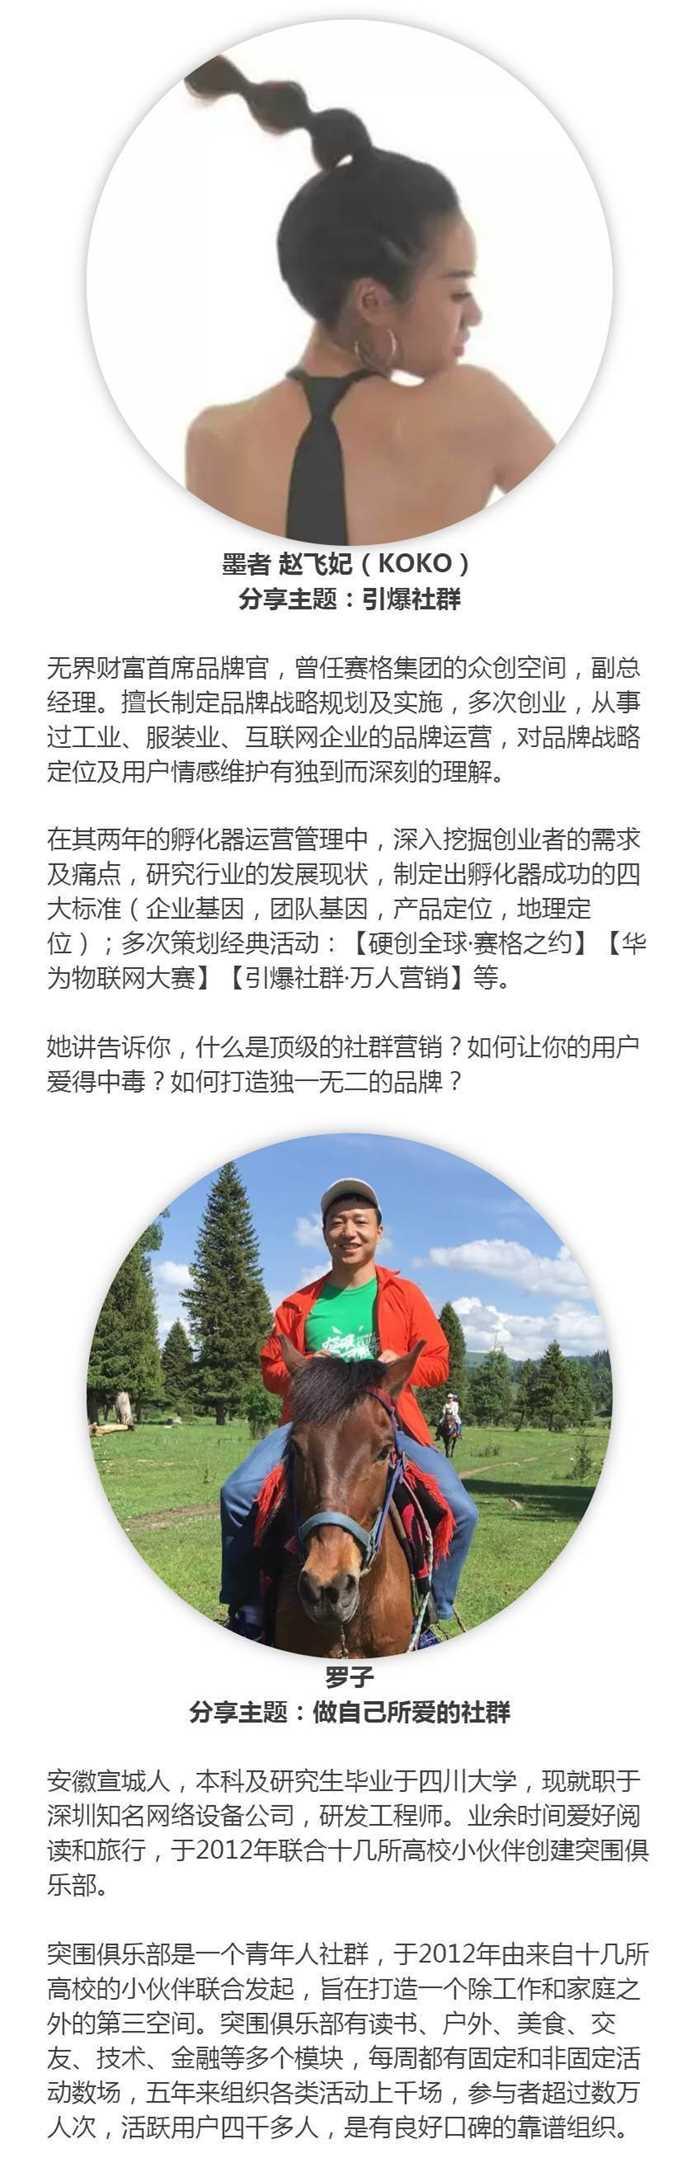 www.huodongxing.com_event_8416087019500 (1).jpg